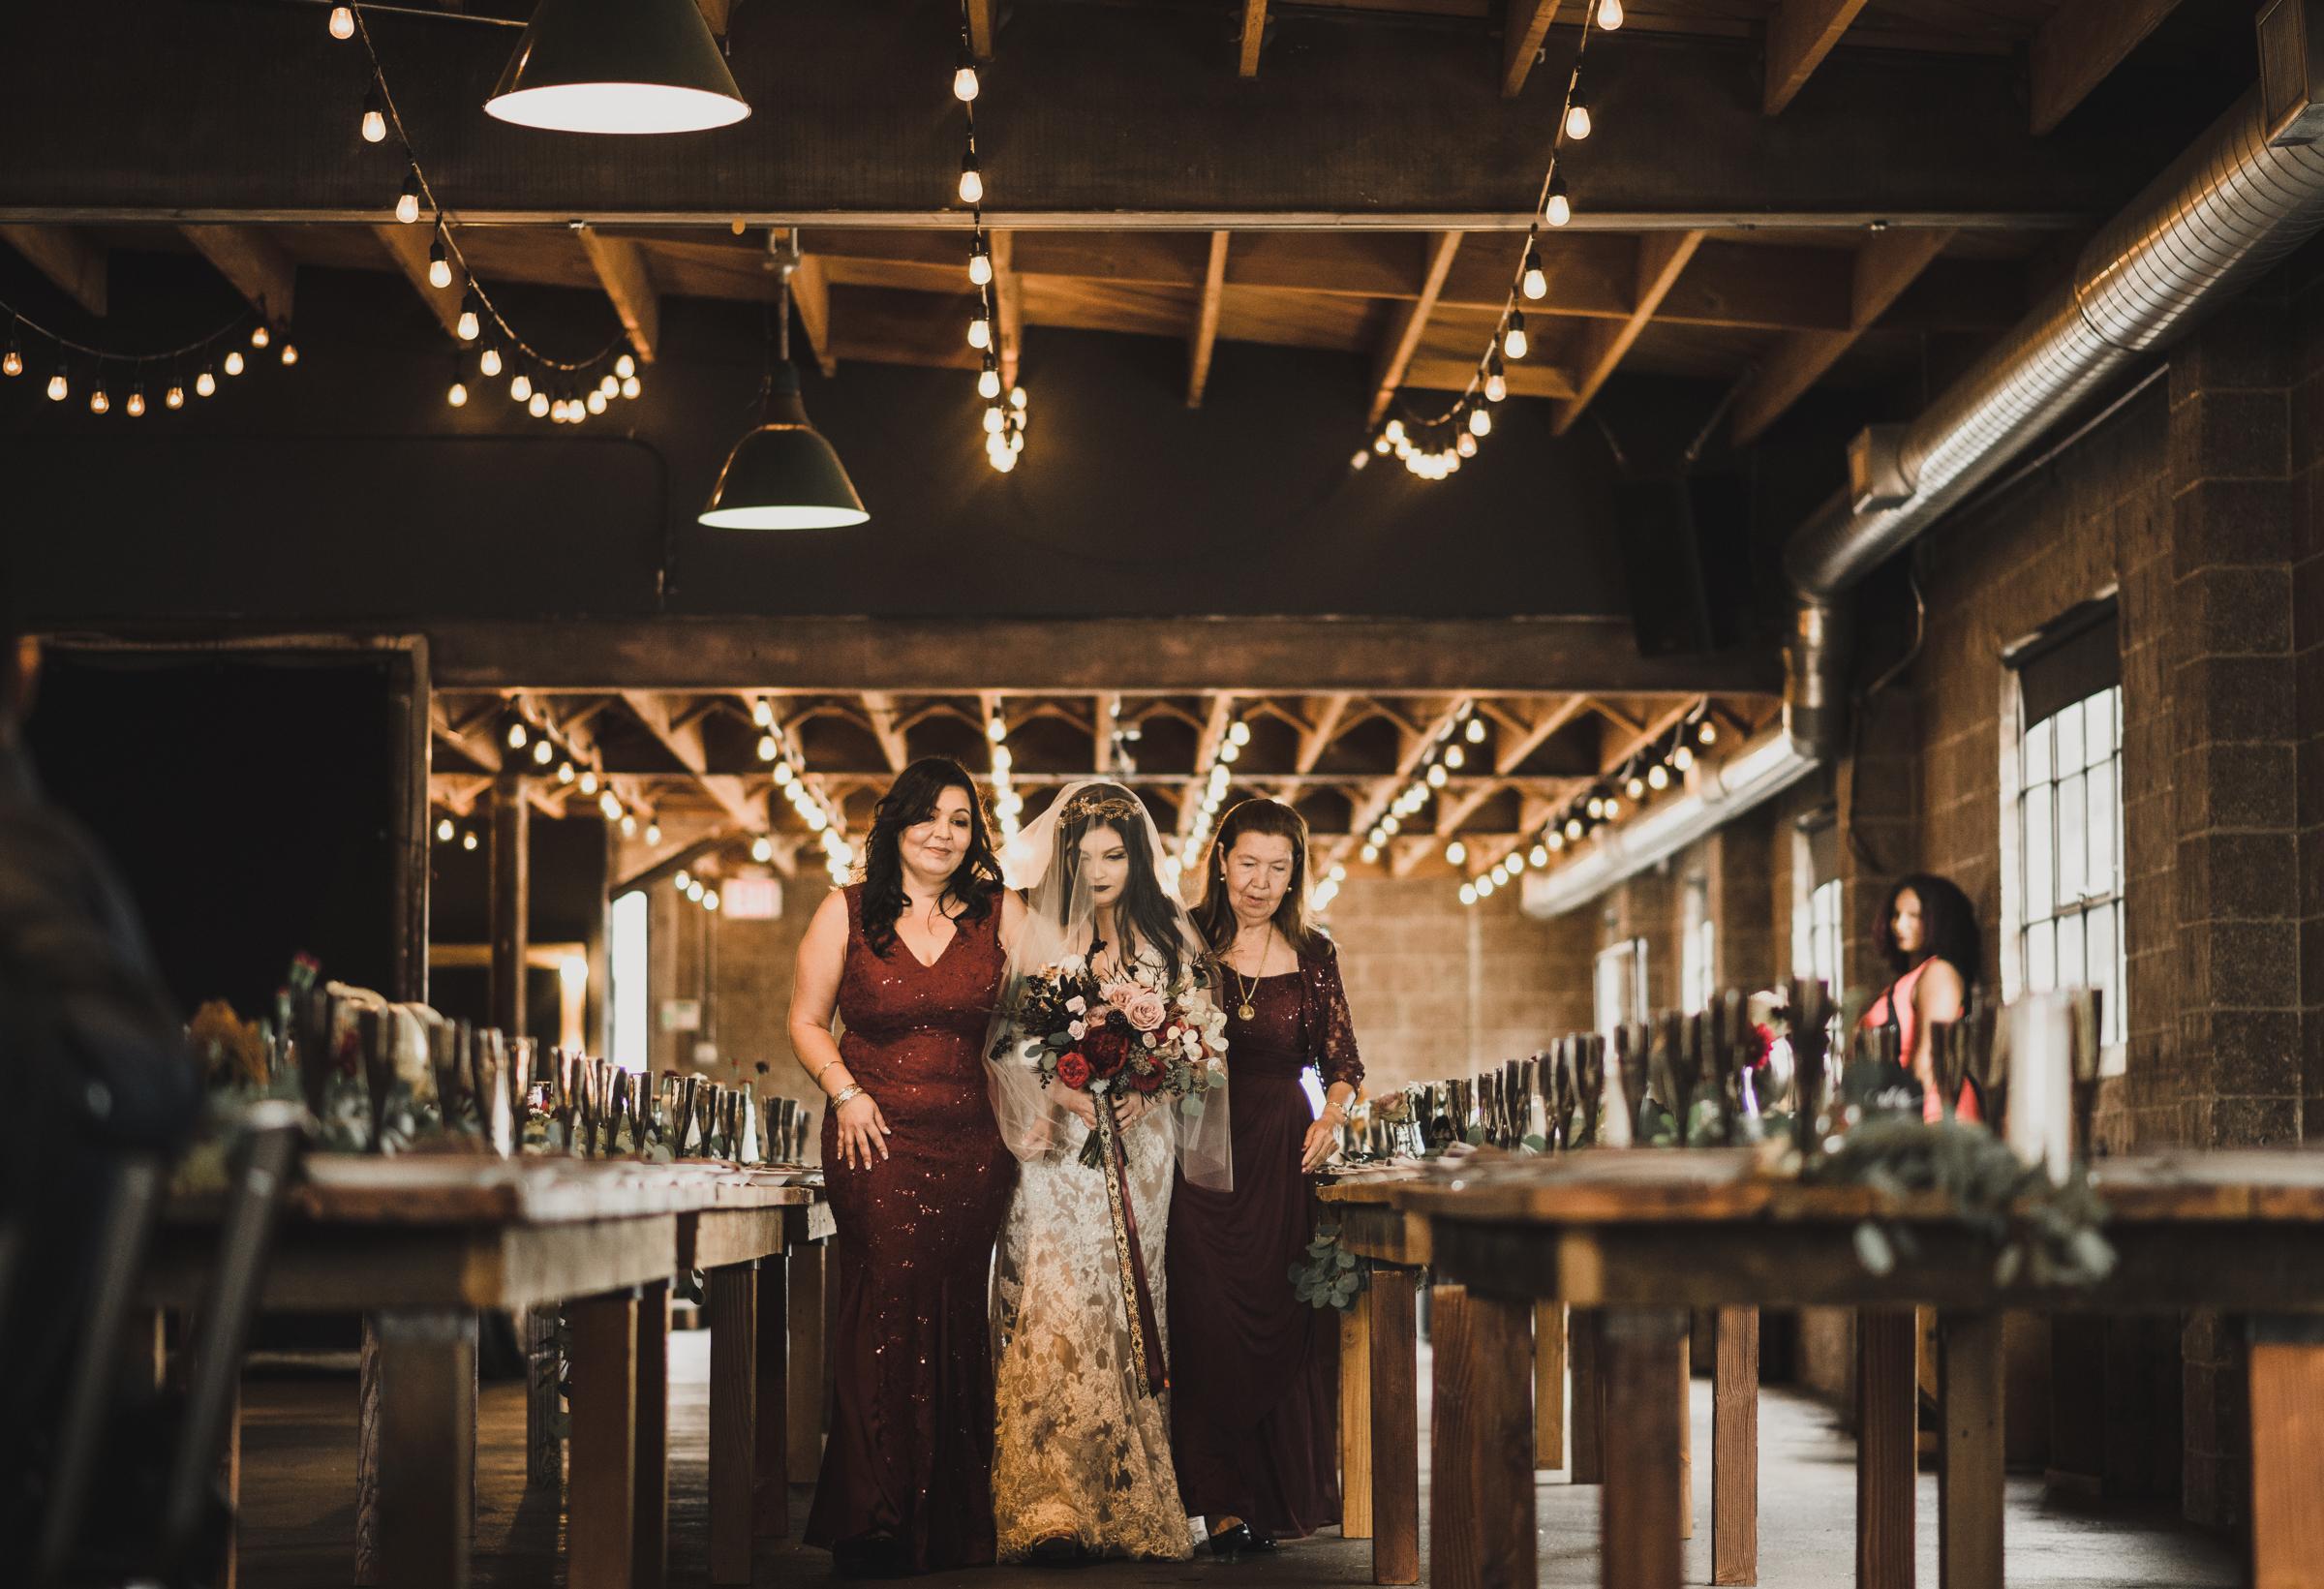 ©Isaiah + Taylor Photography - Smoky Hollow Studios Wedding, El Segundo, Los Angeles Wedding Photographer-45.jpg